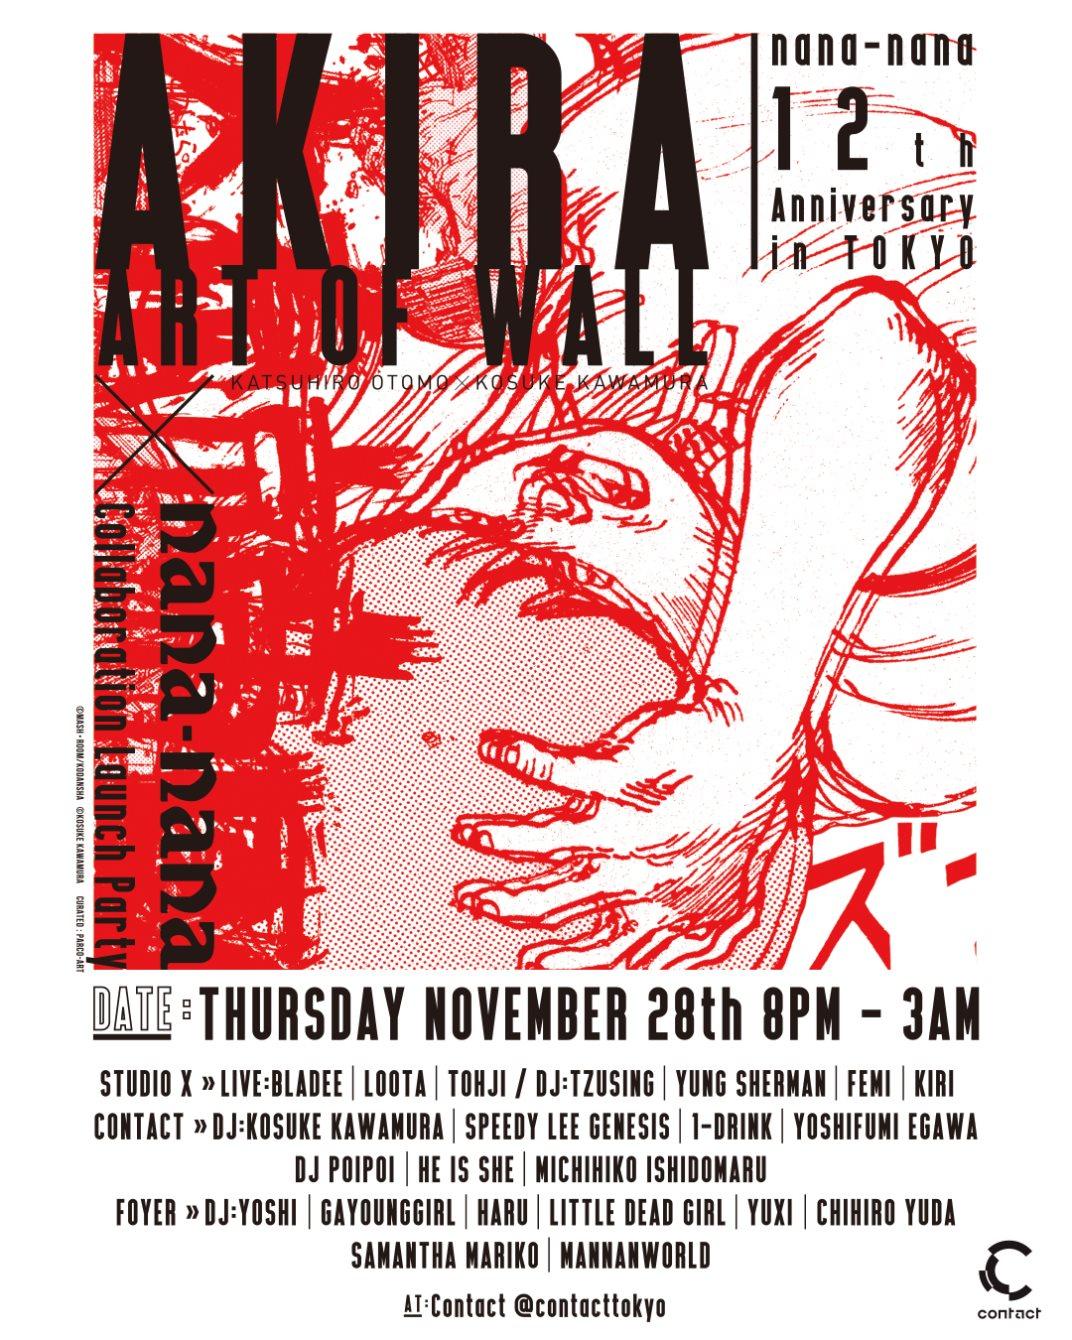 Akira Art of Wall x Nana-Nana Collaboration Launch Party - Nana-Nana 12th Anniversary in Tokyo - Flyer front